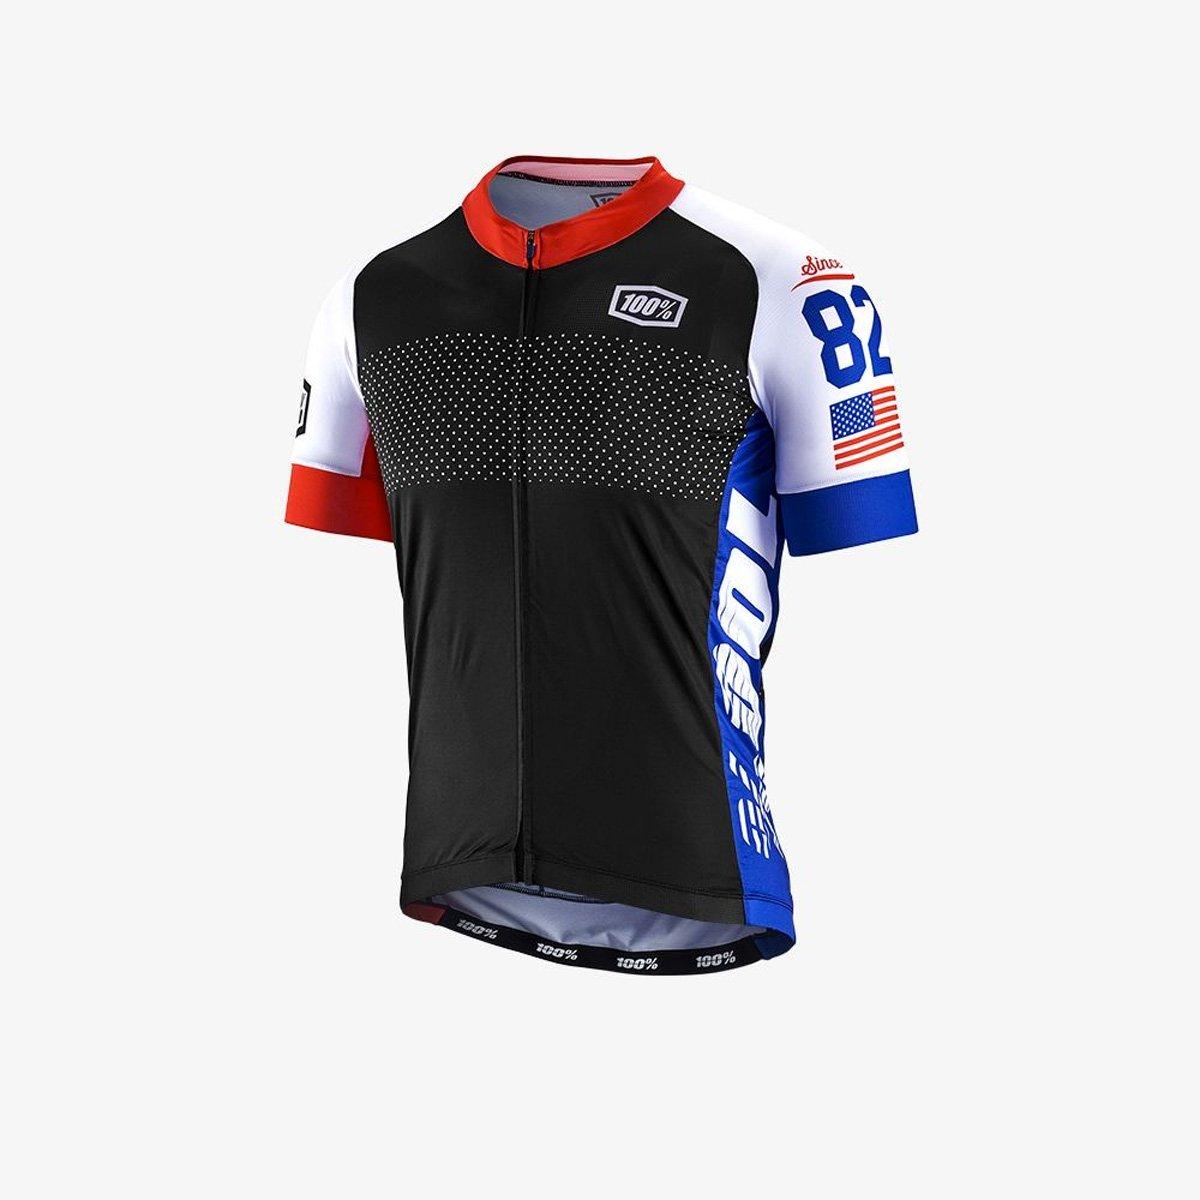 0f6e5ba10 100% Percent 2018 Men s Tour Zip Short Sleeve Cycling Jersey – Bike ...